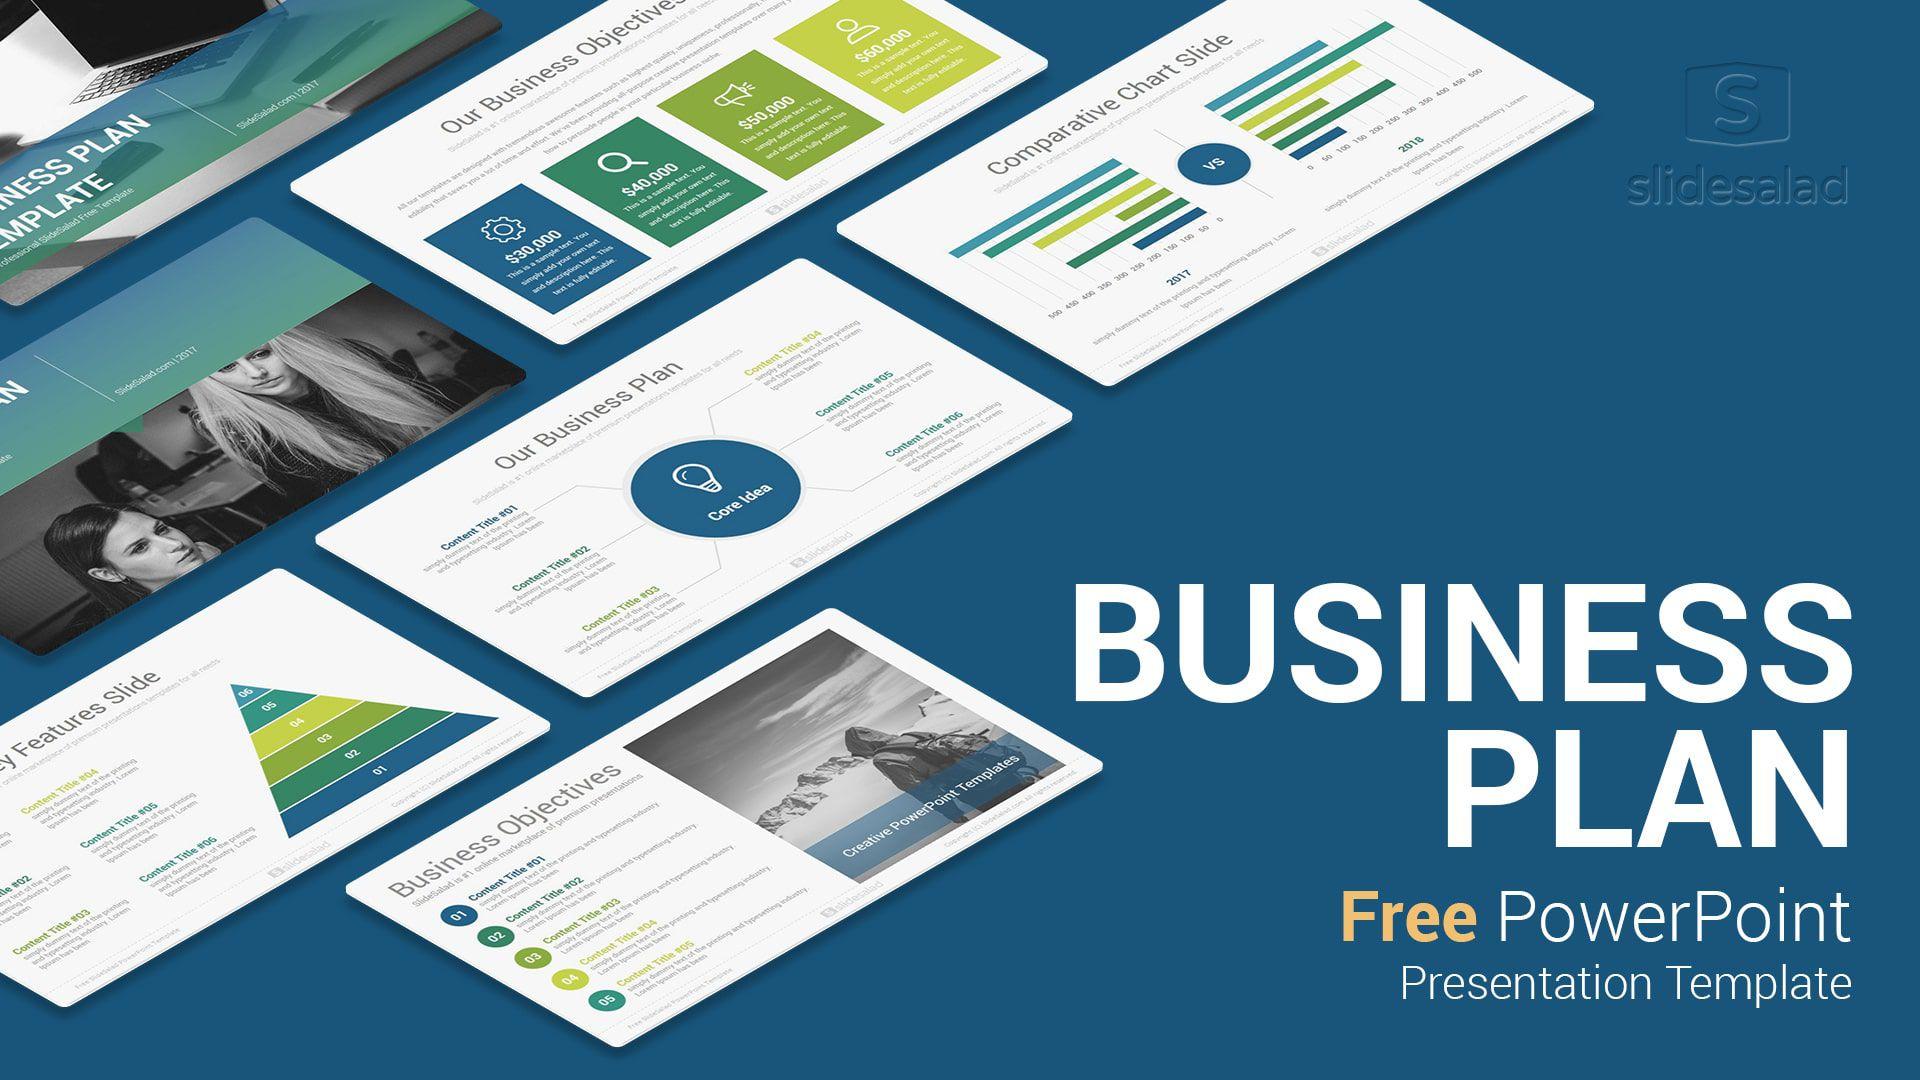 007 Beautiful Free Busines Plan Powerpoint Template Download Design  Modern UltimateFull